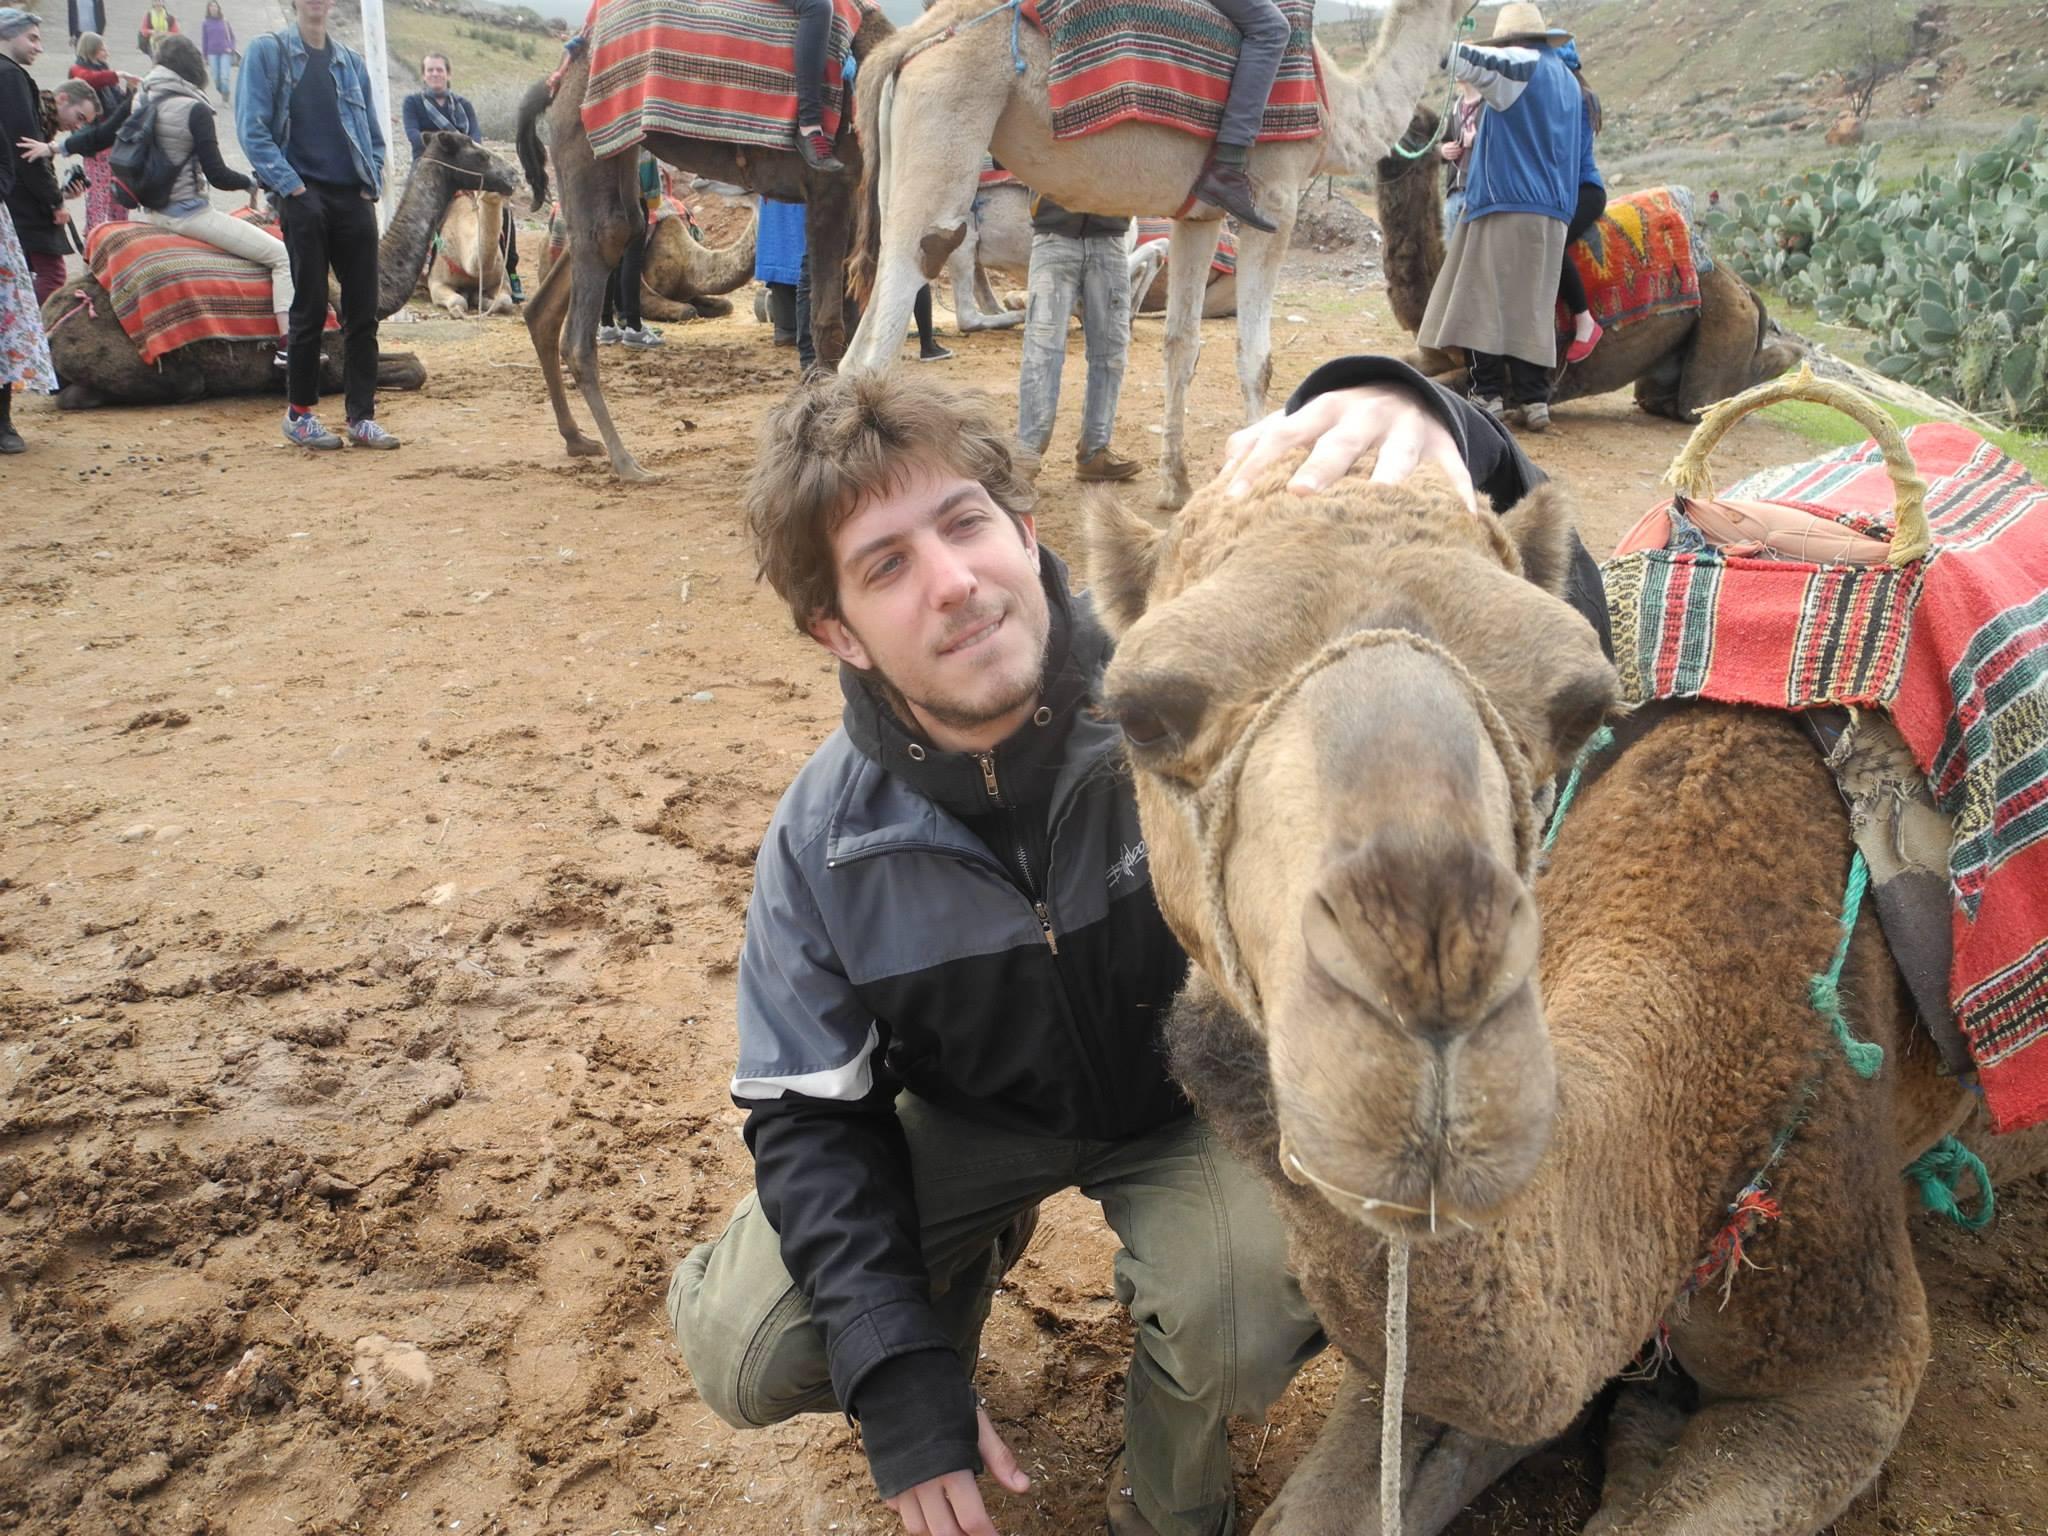 Me & Camel